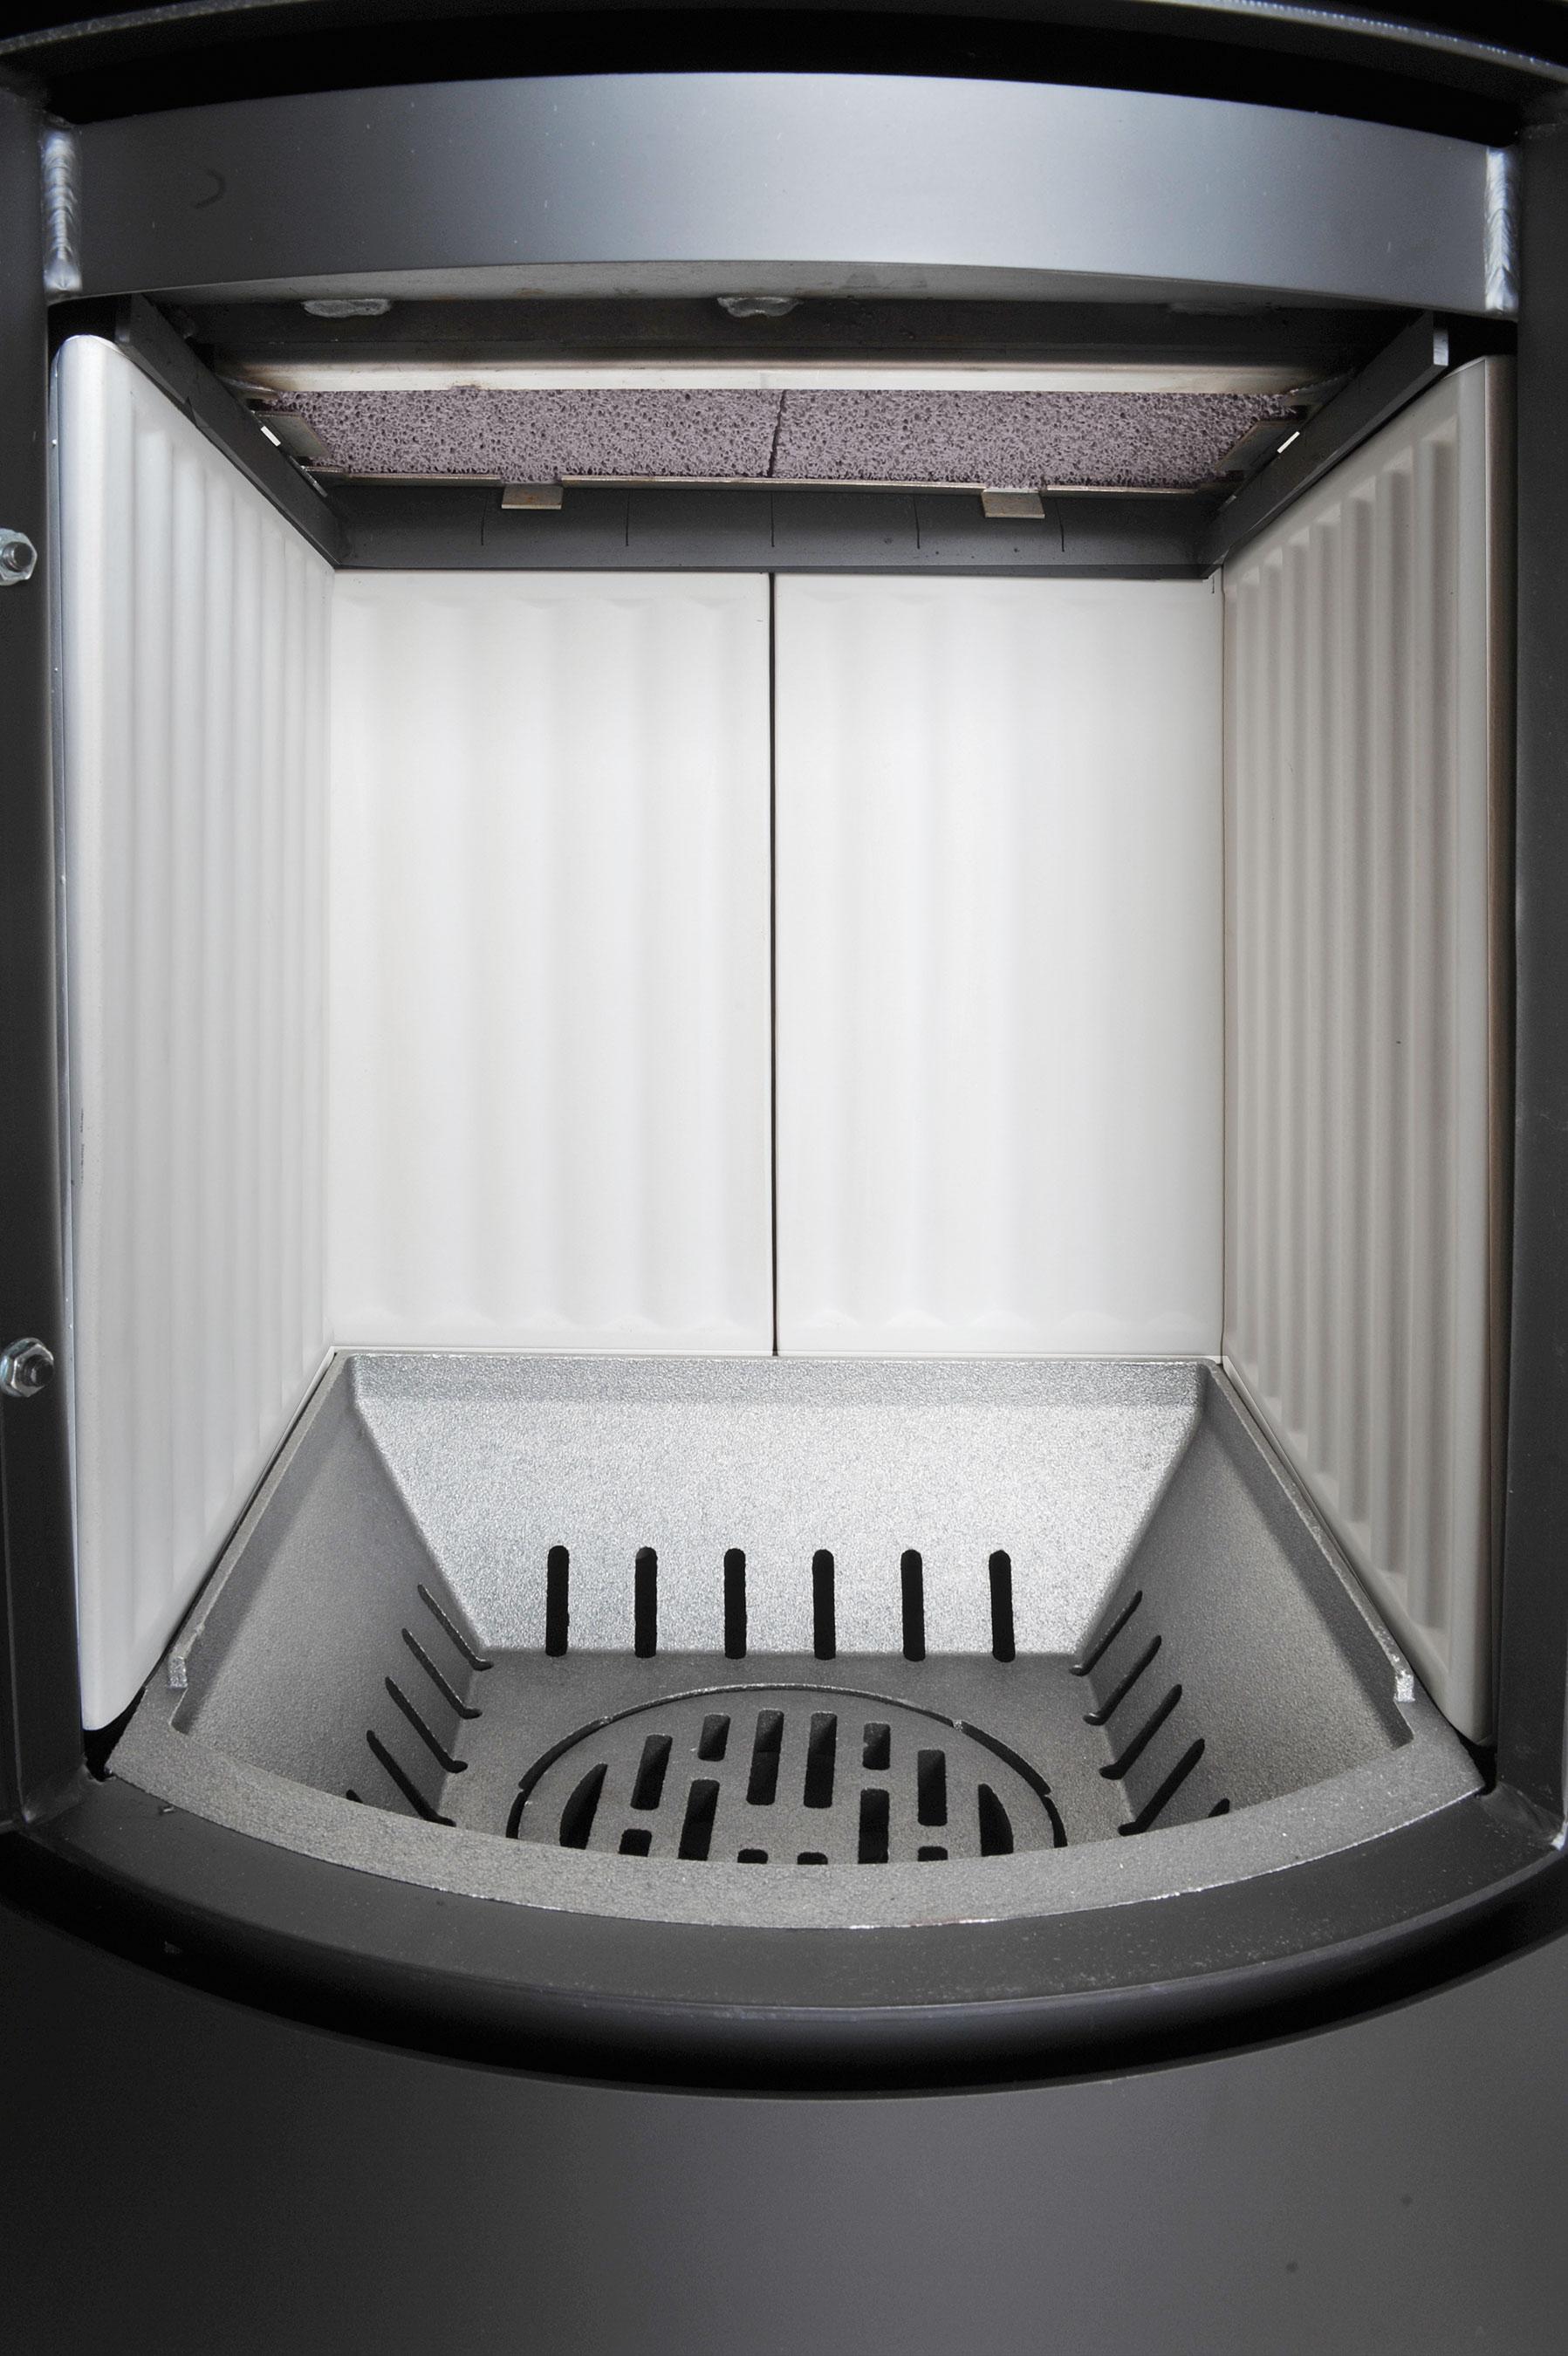 Kaminofen / Dauerbrandofen Hark Vito WW ECOplus wasserf. schw. 8,4kW Bild 4